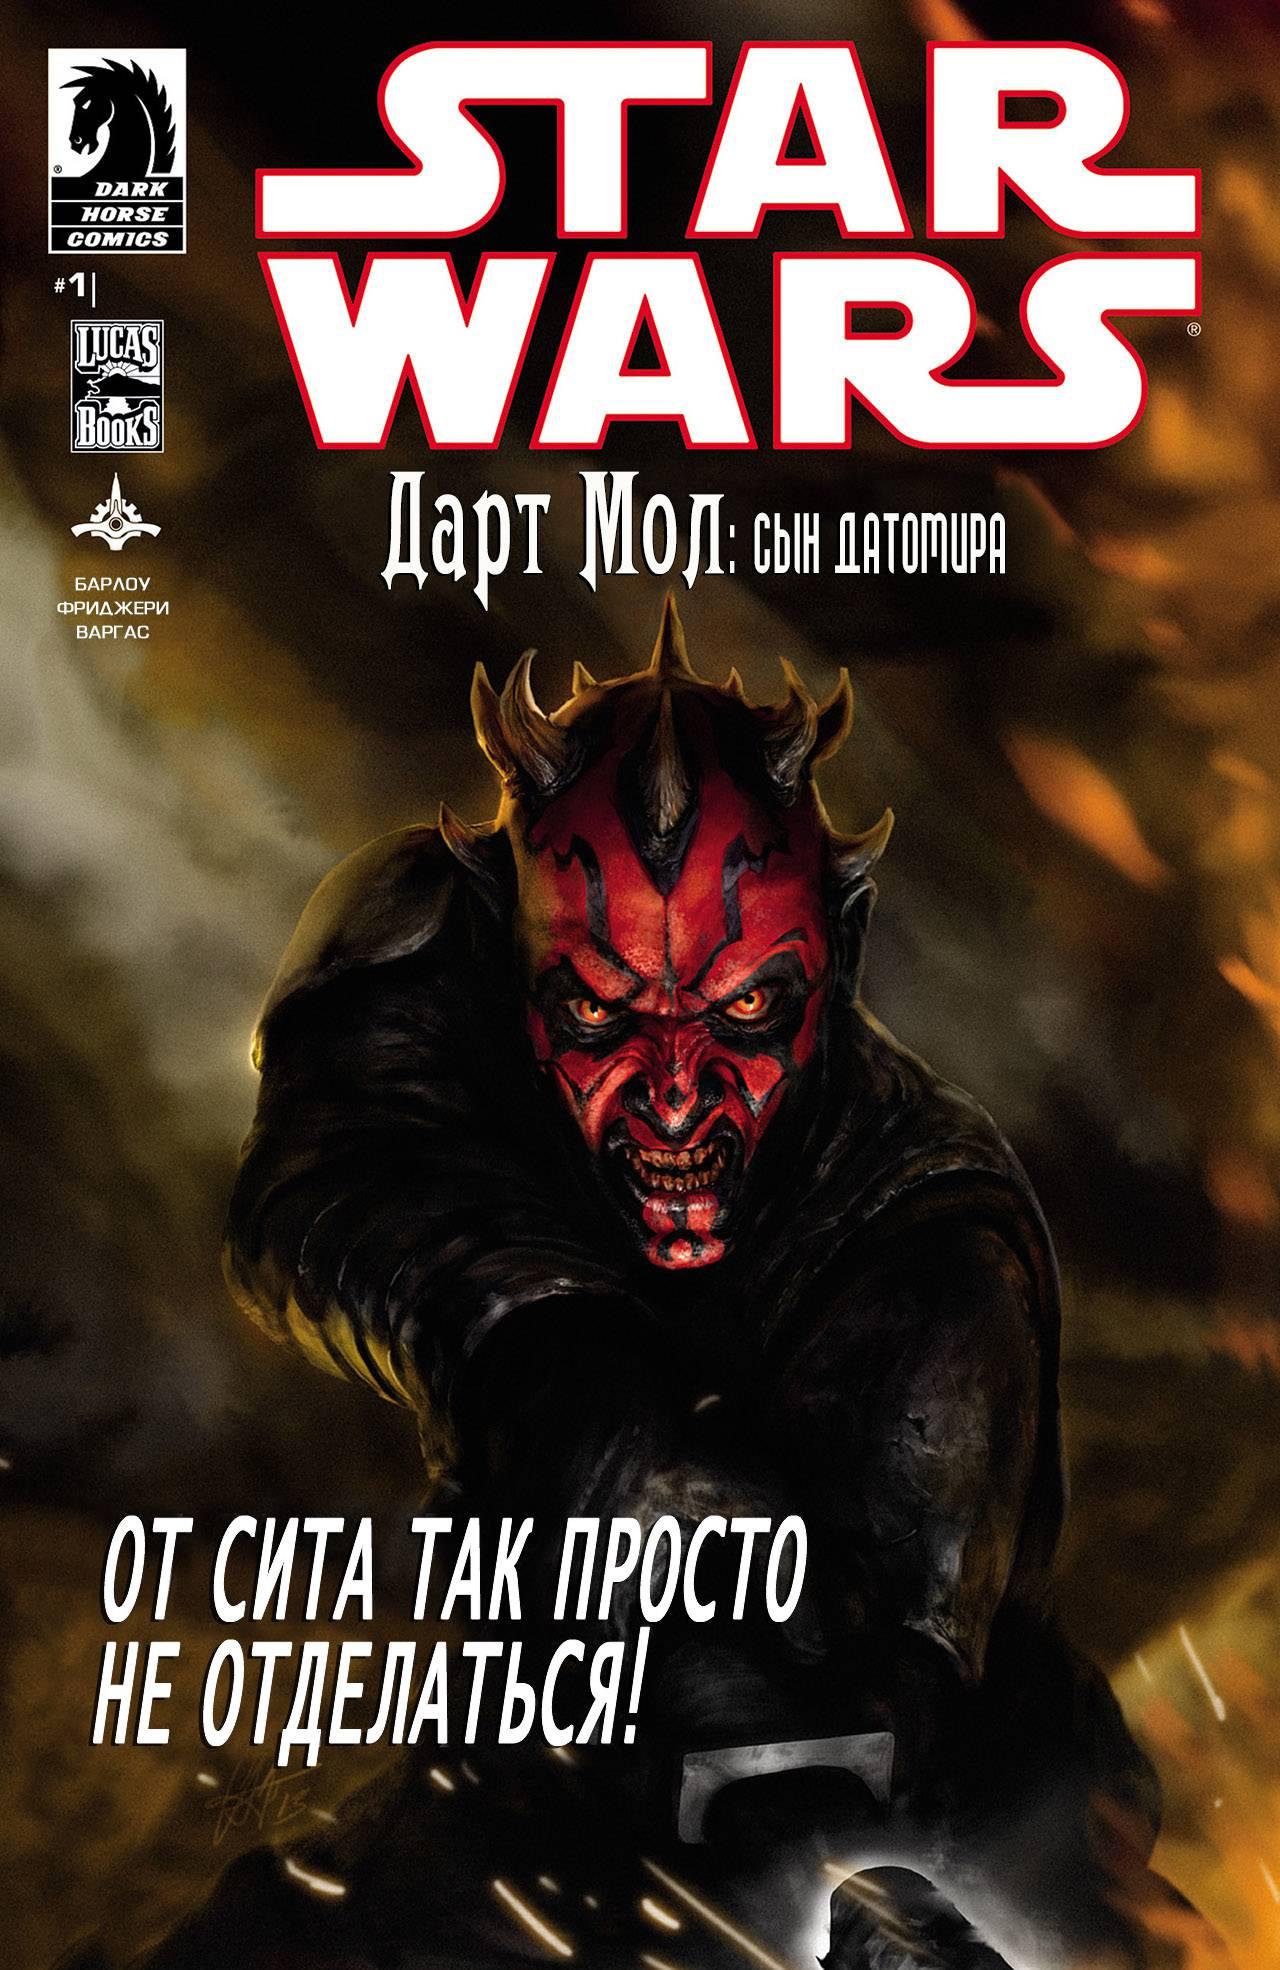 Звездные Войны: Дарт Мол - Сын Датомира №1 онлайн